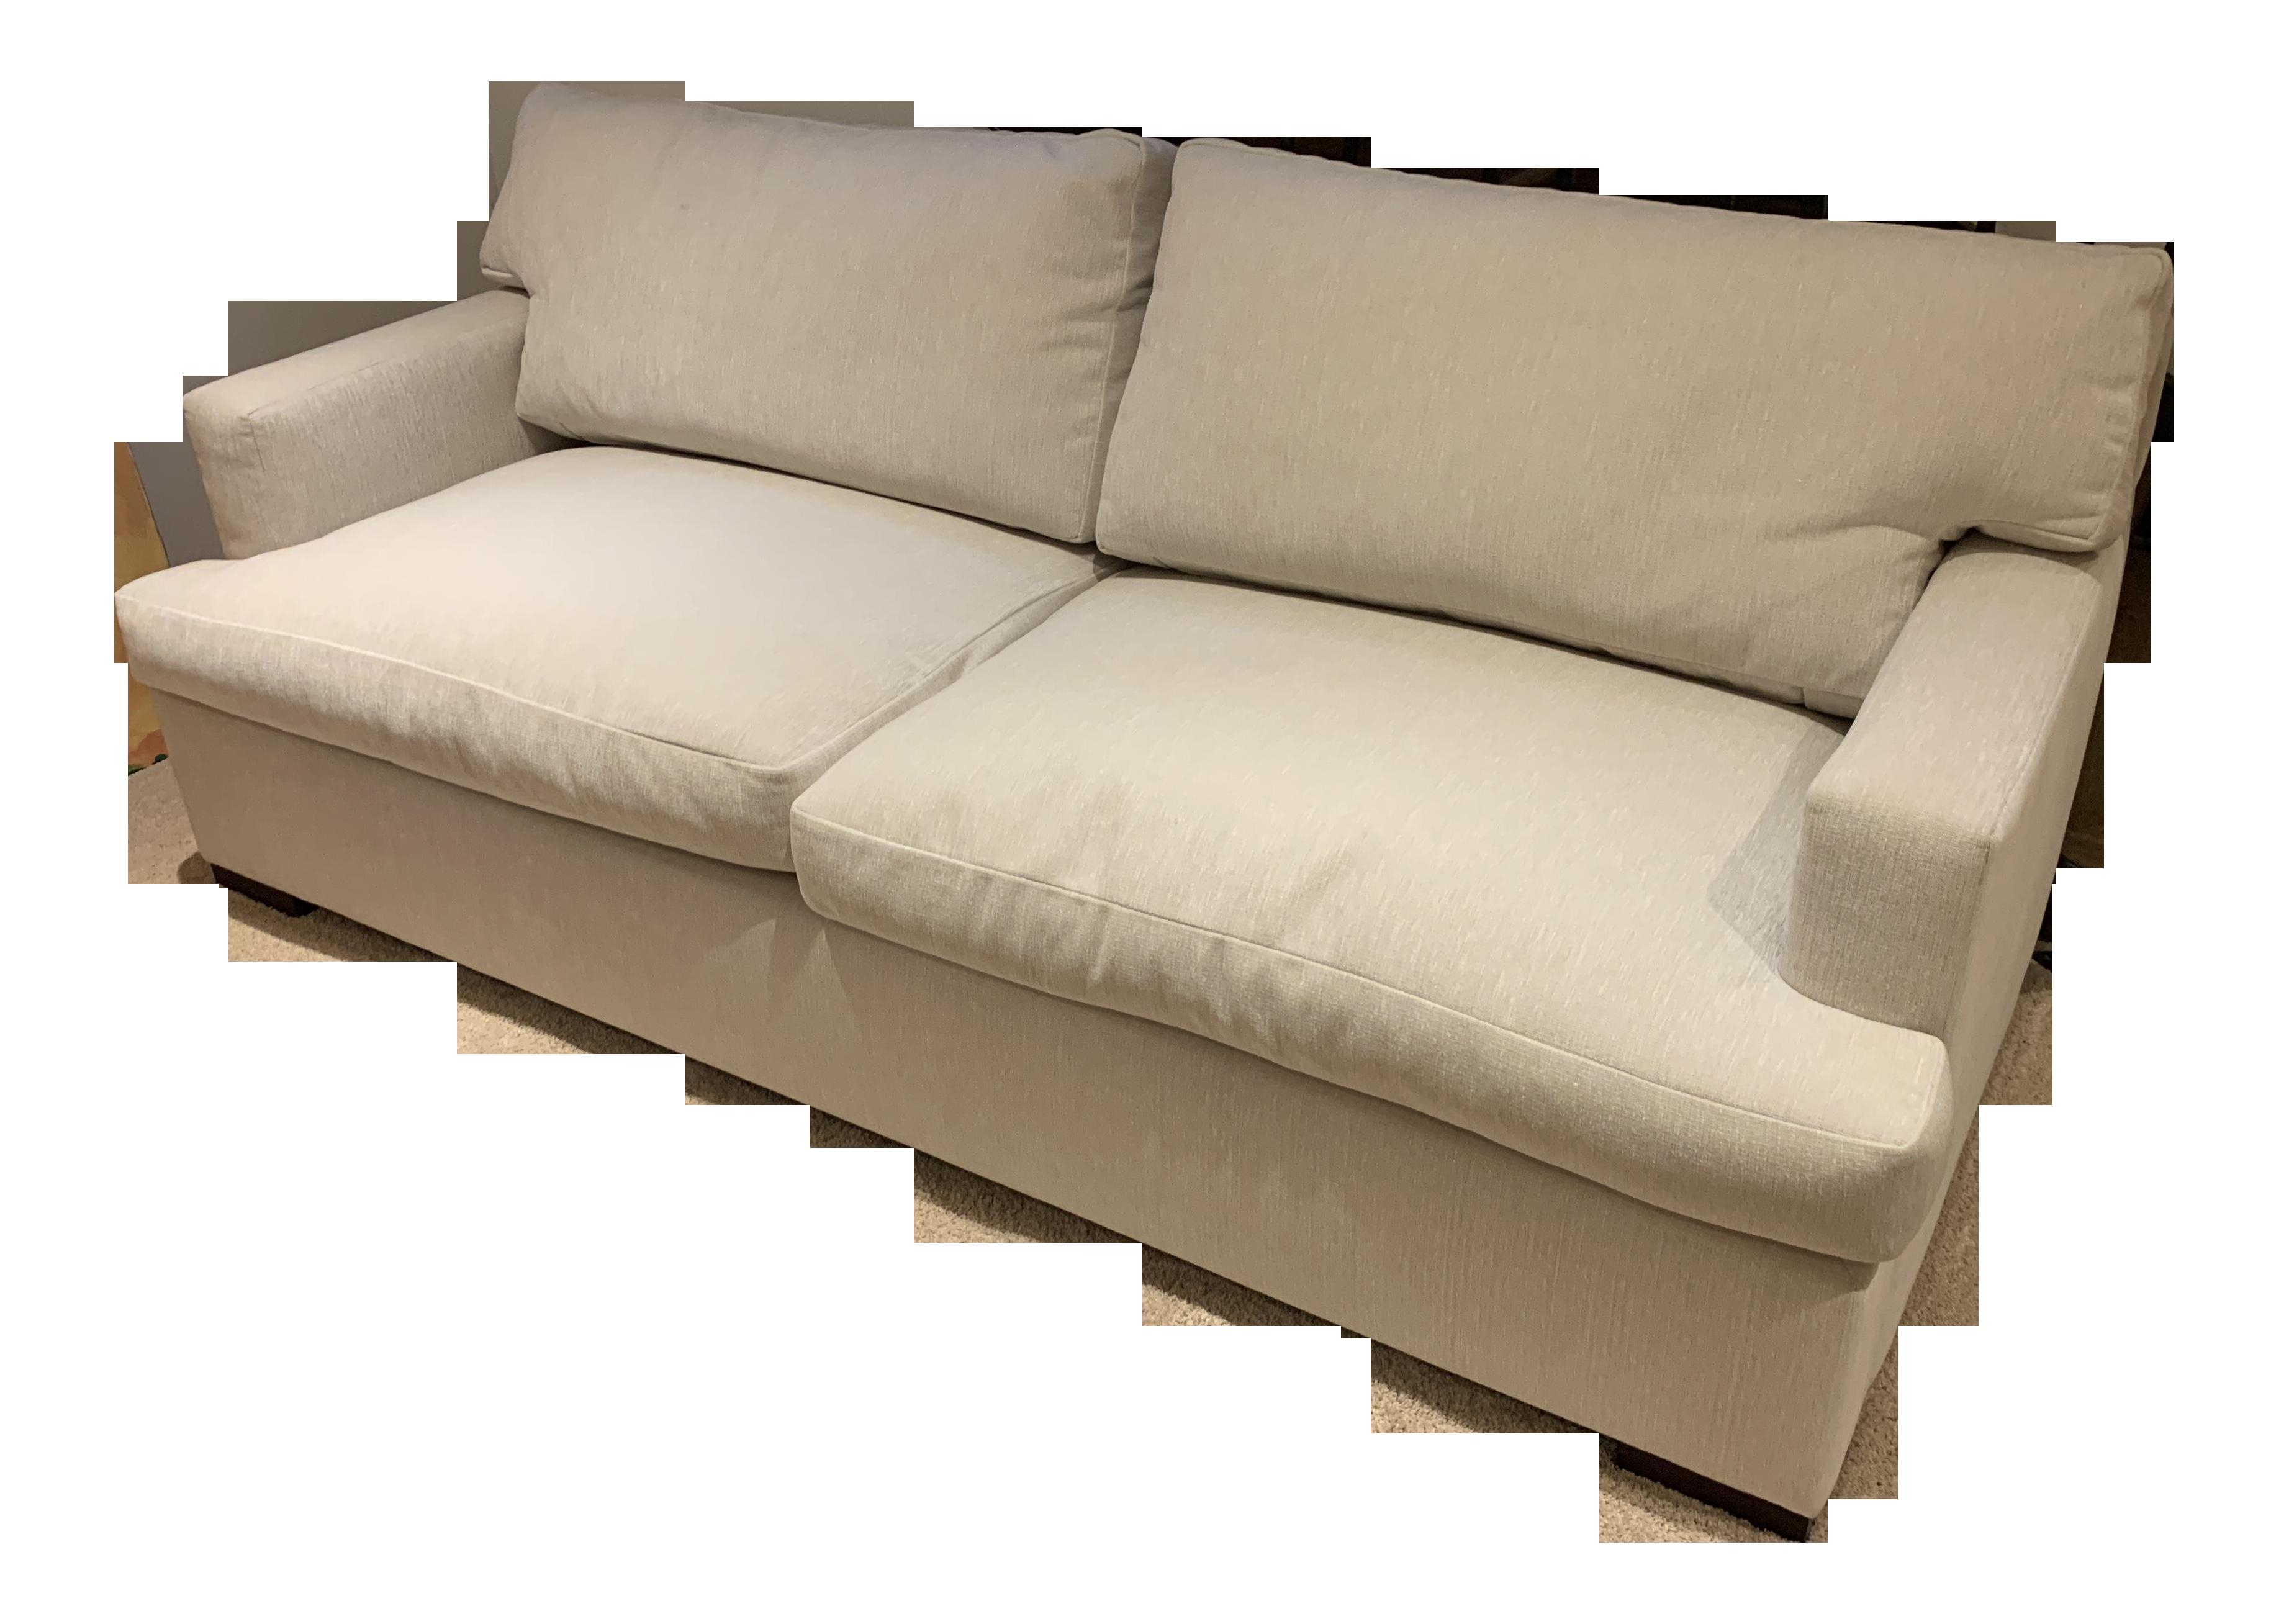 Contemporary A. Rudin Sleeper Sofa